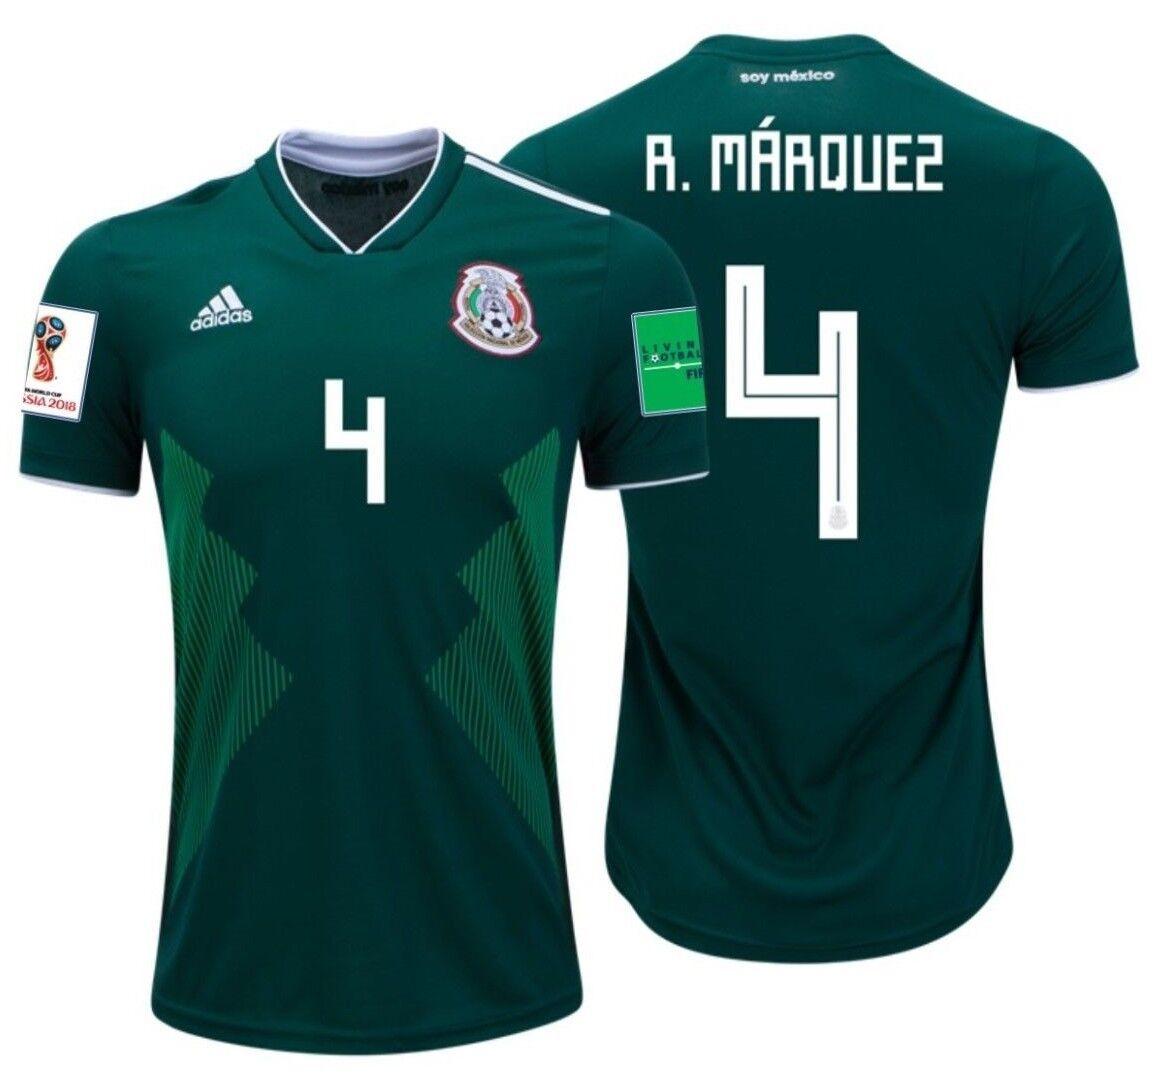 Adidas Rafael Marquez México Home Jersey Copa Del Mundo 2018 Parches